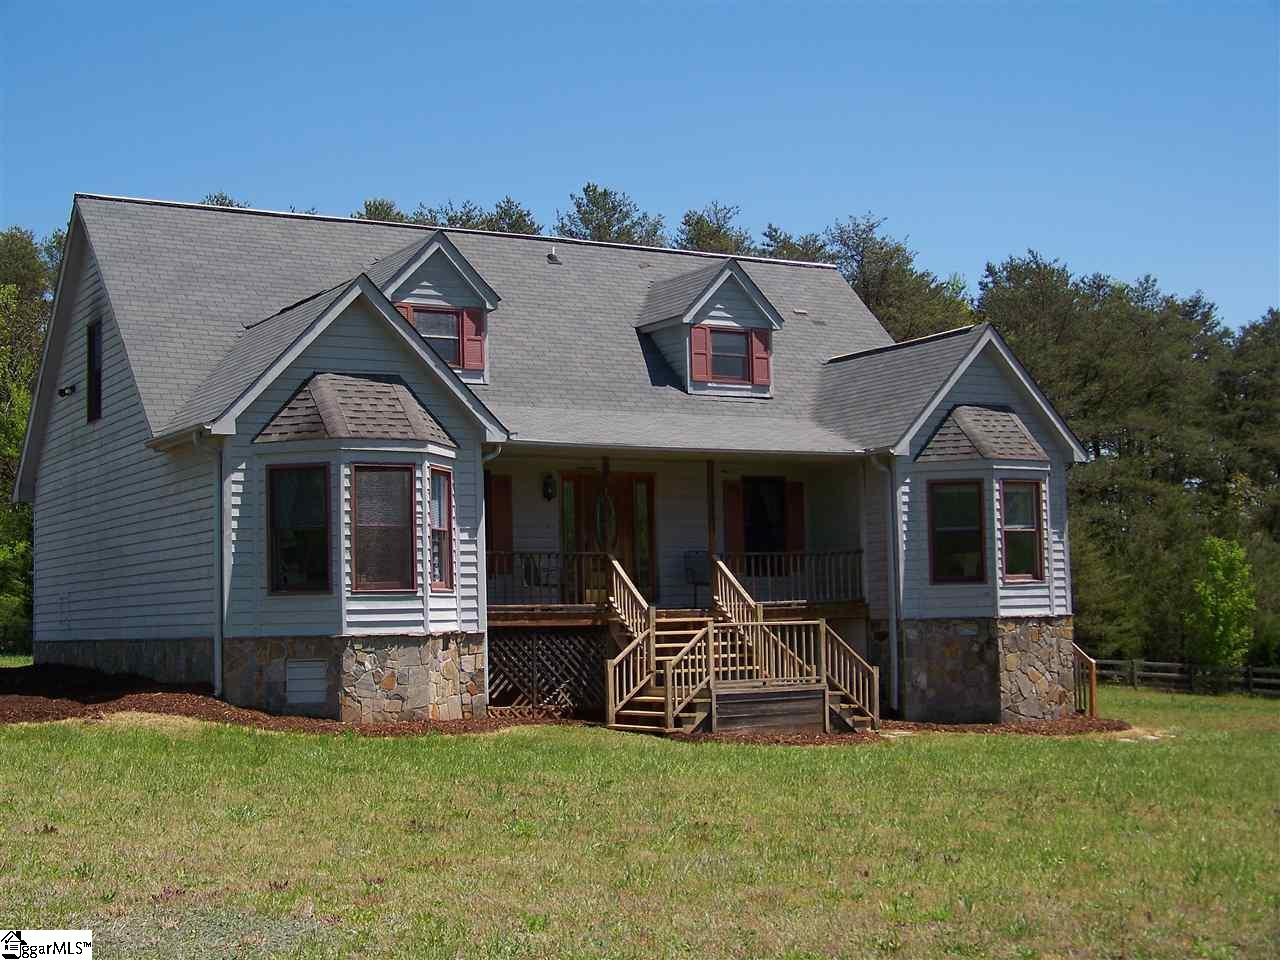 780 Dalton Rd, Mill Spring, NC, 28756